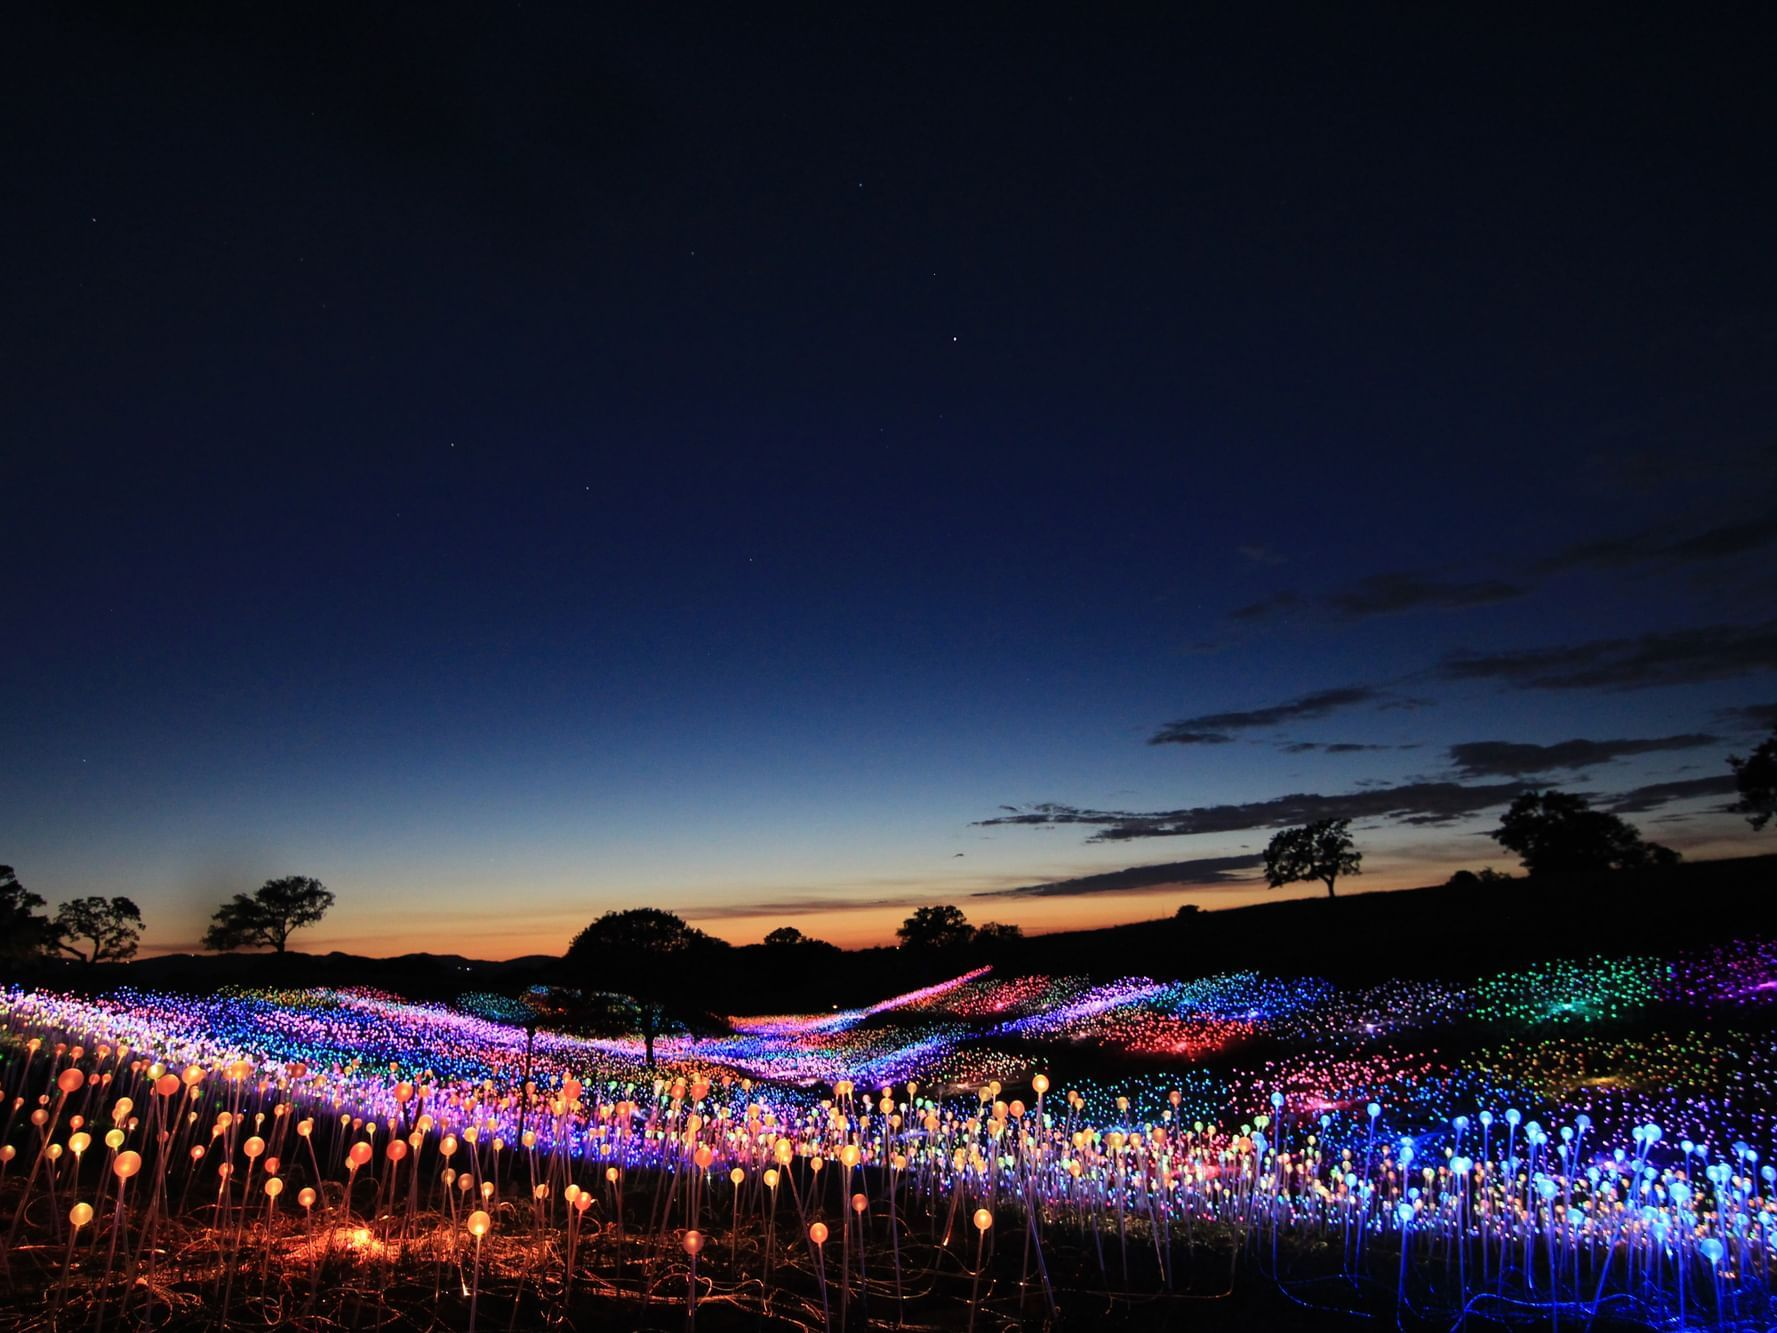 Field of Lights at Sensorio